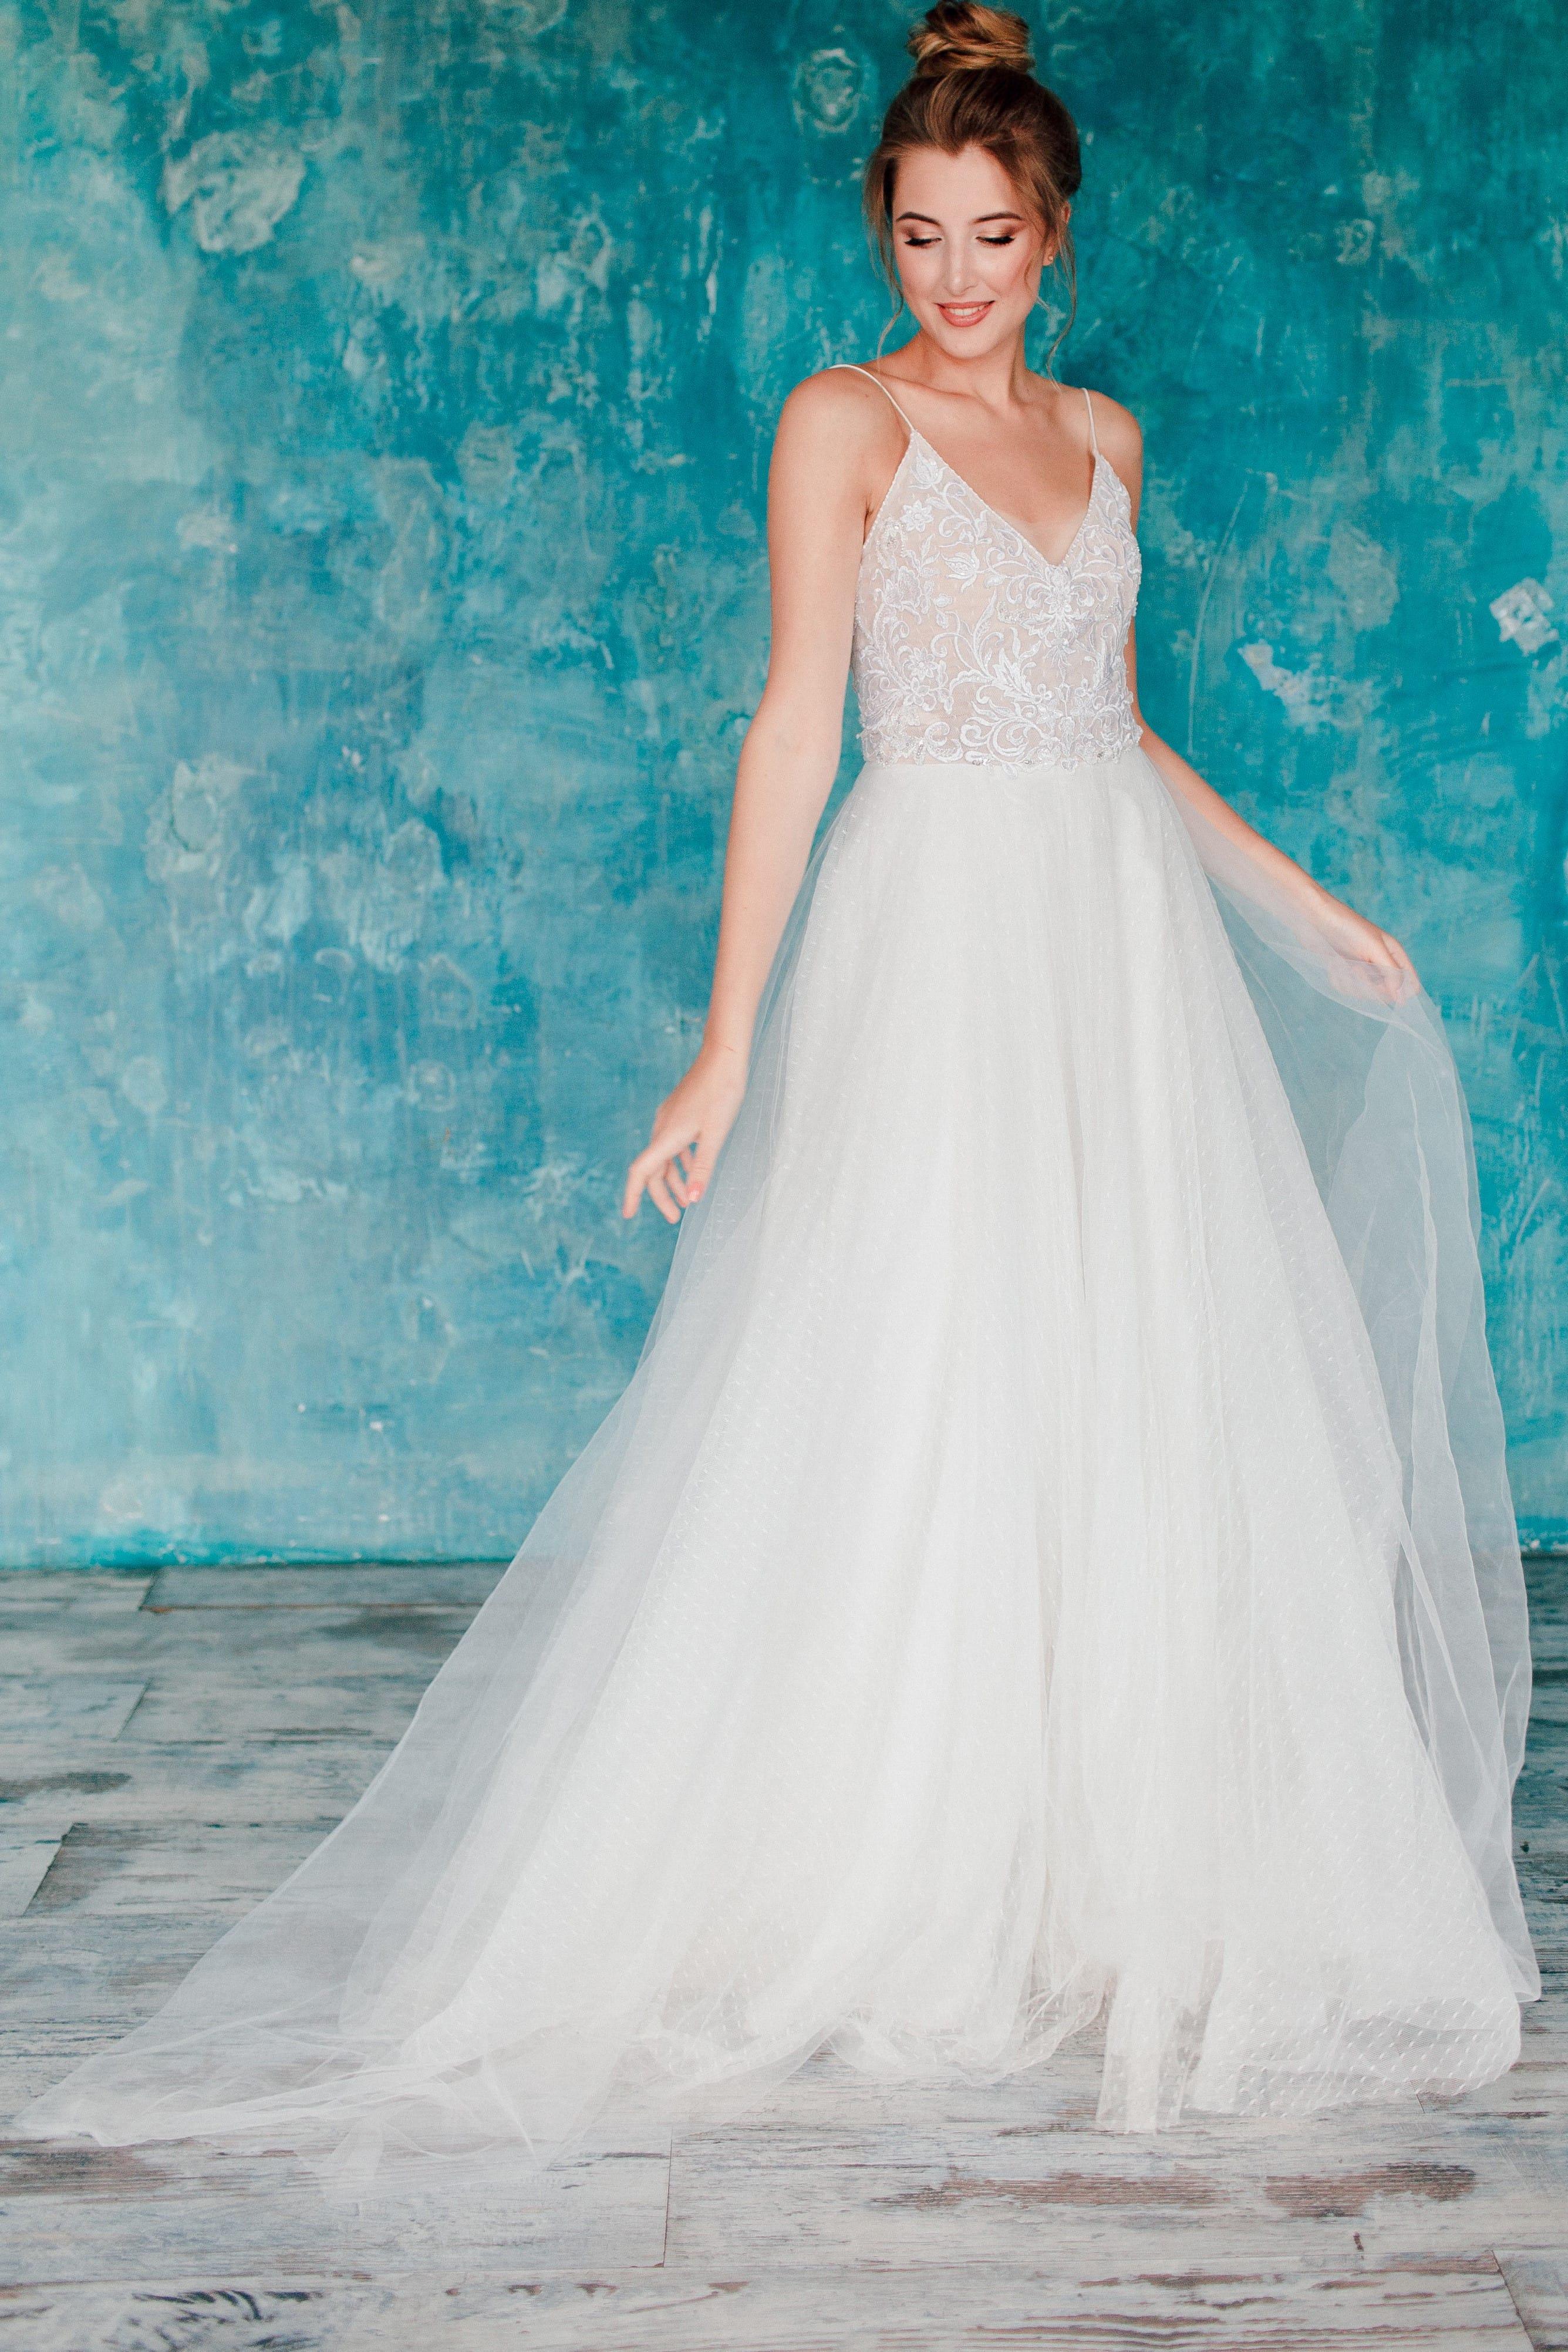 Свадебное платье ASTER, коллекция THE ANGELS, бренд RARE BRIDAL, фото 4